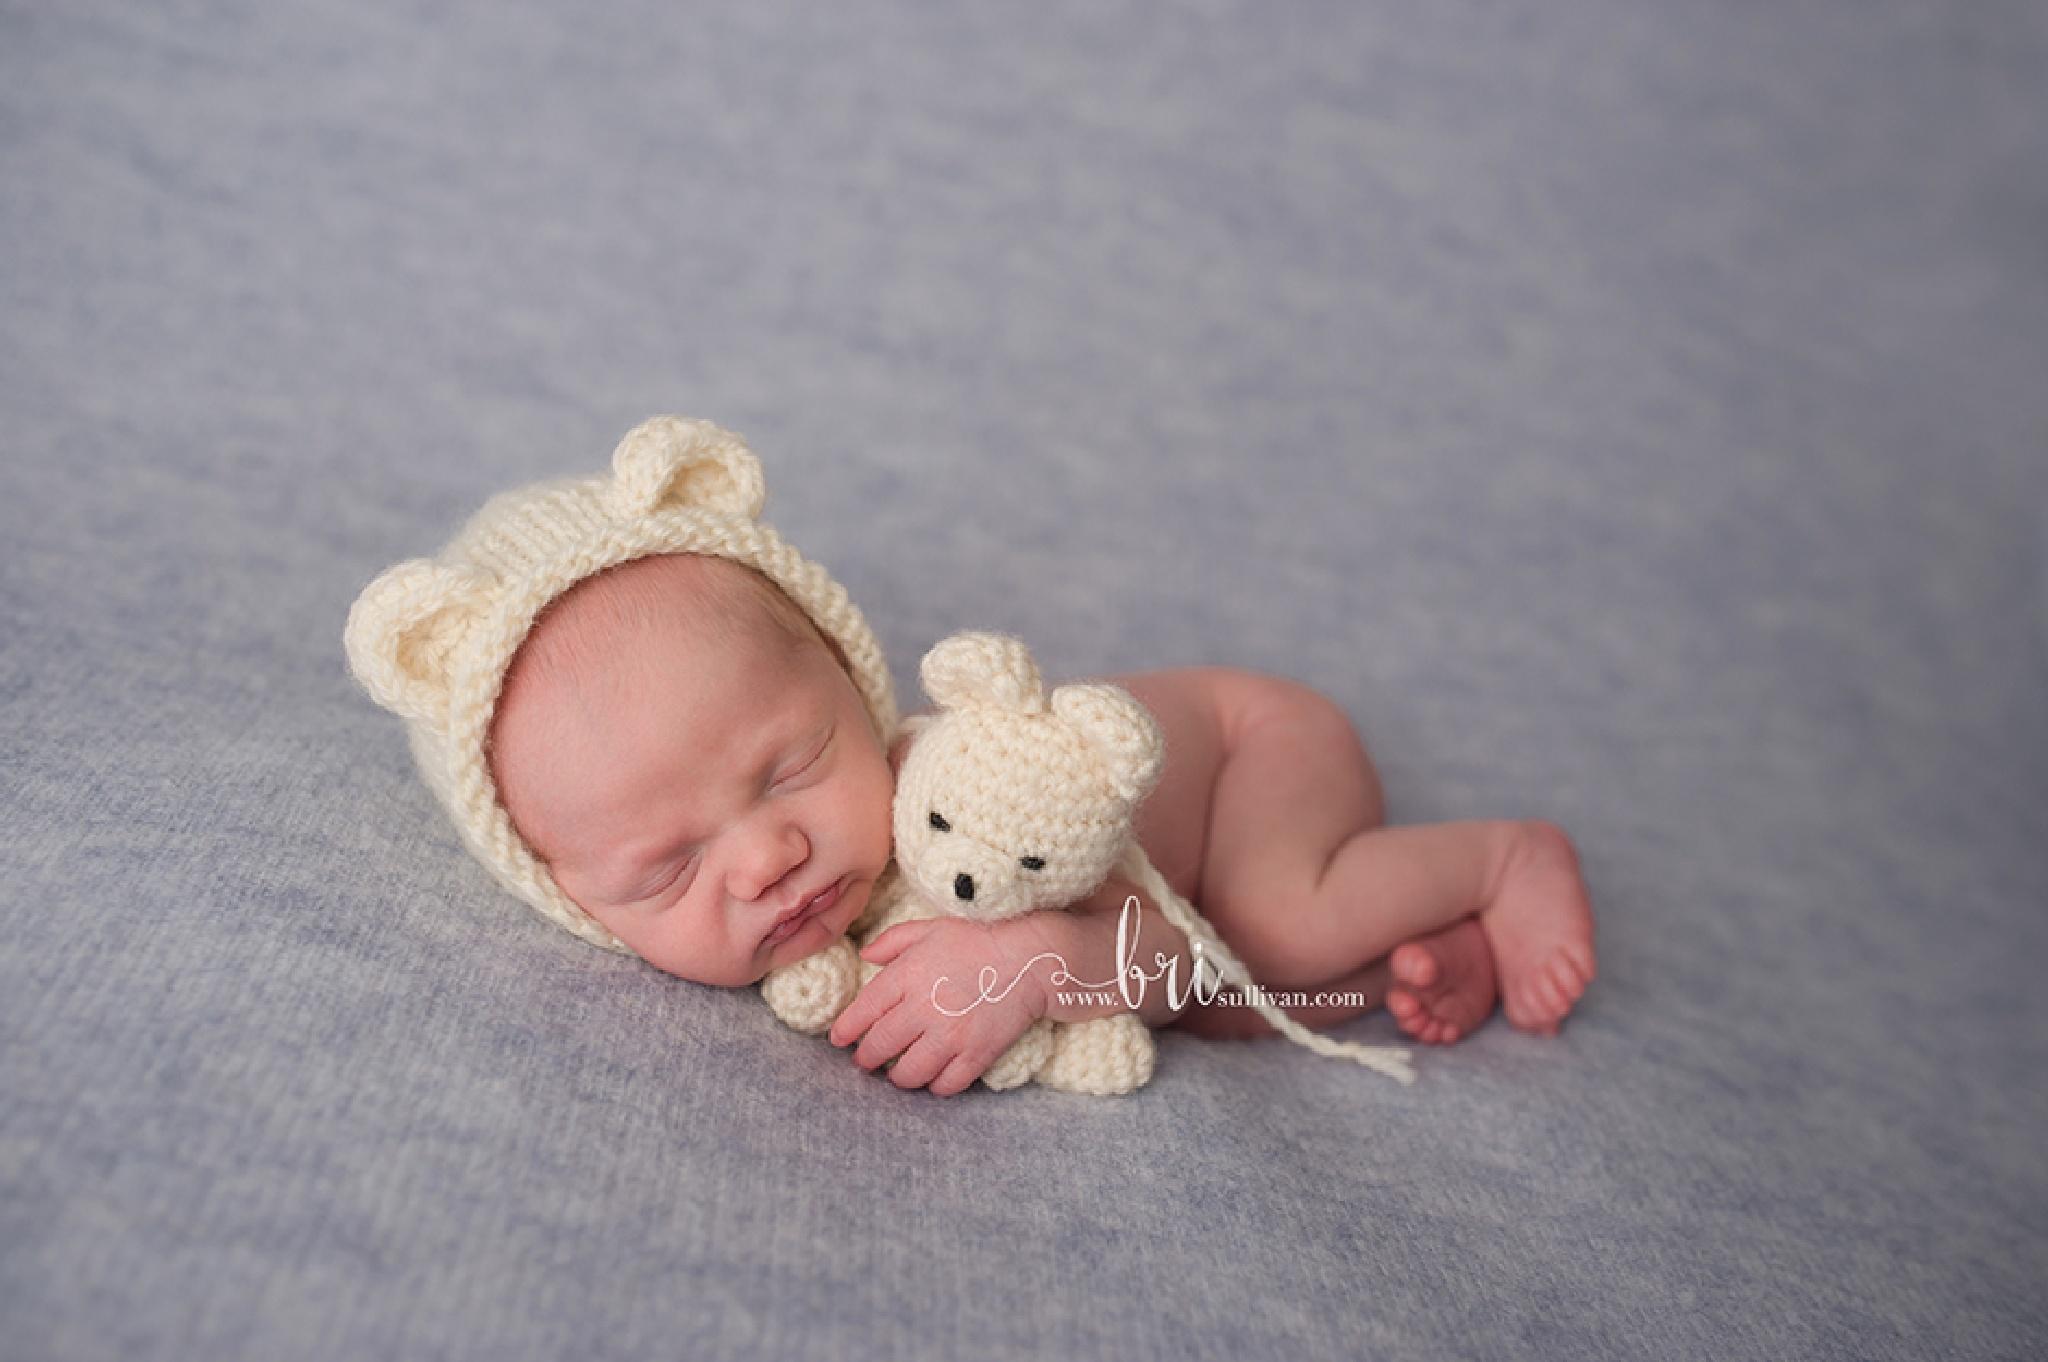 Houston Newborn Photography by cherrystreetphoto